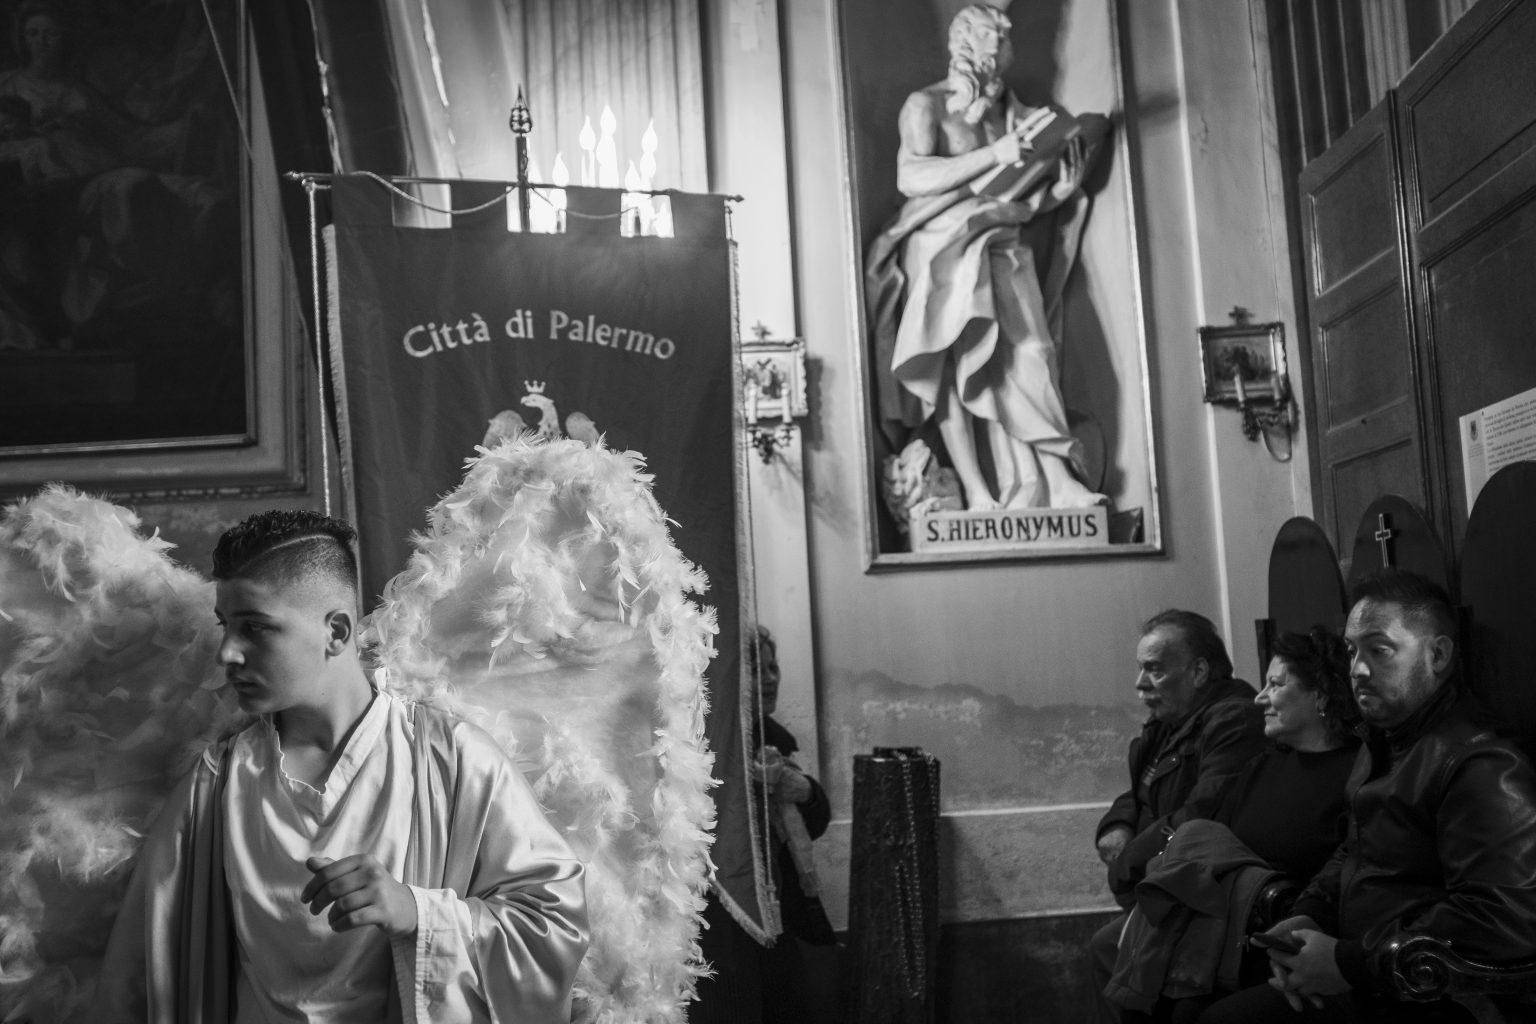 holy-friday-palermo-italy-2019venerdi-santo-palermo-italia-2019